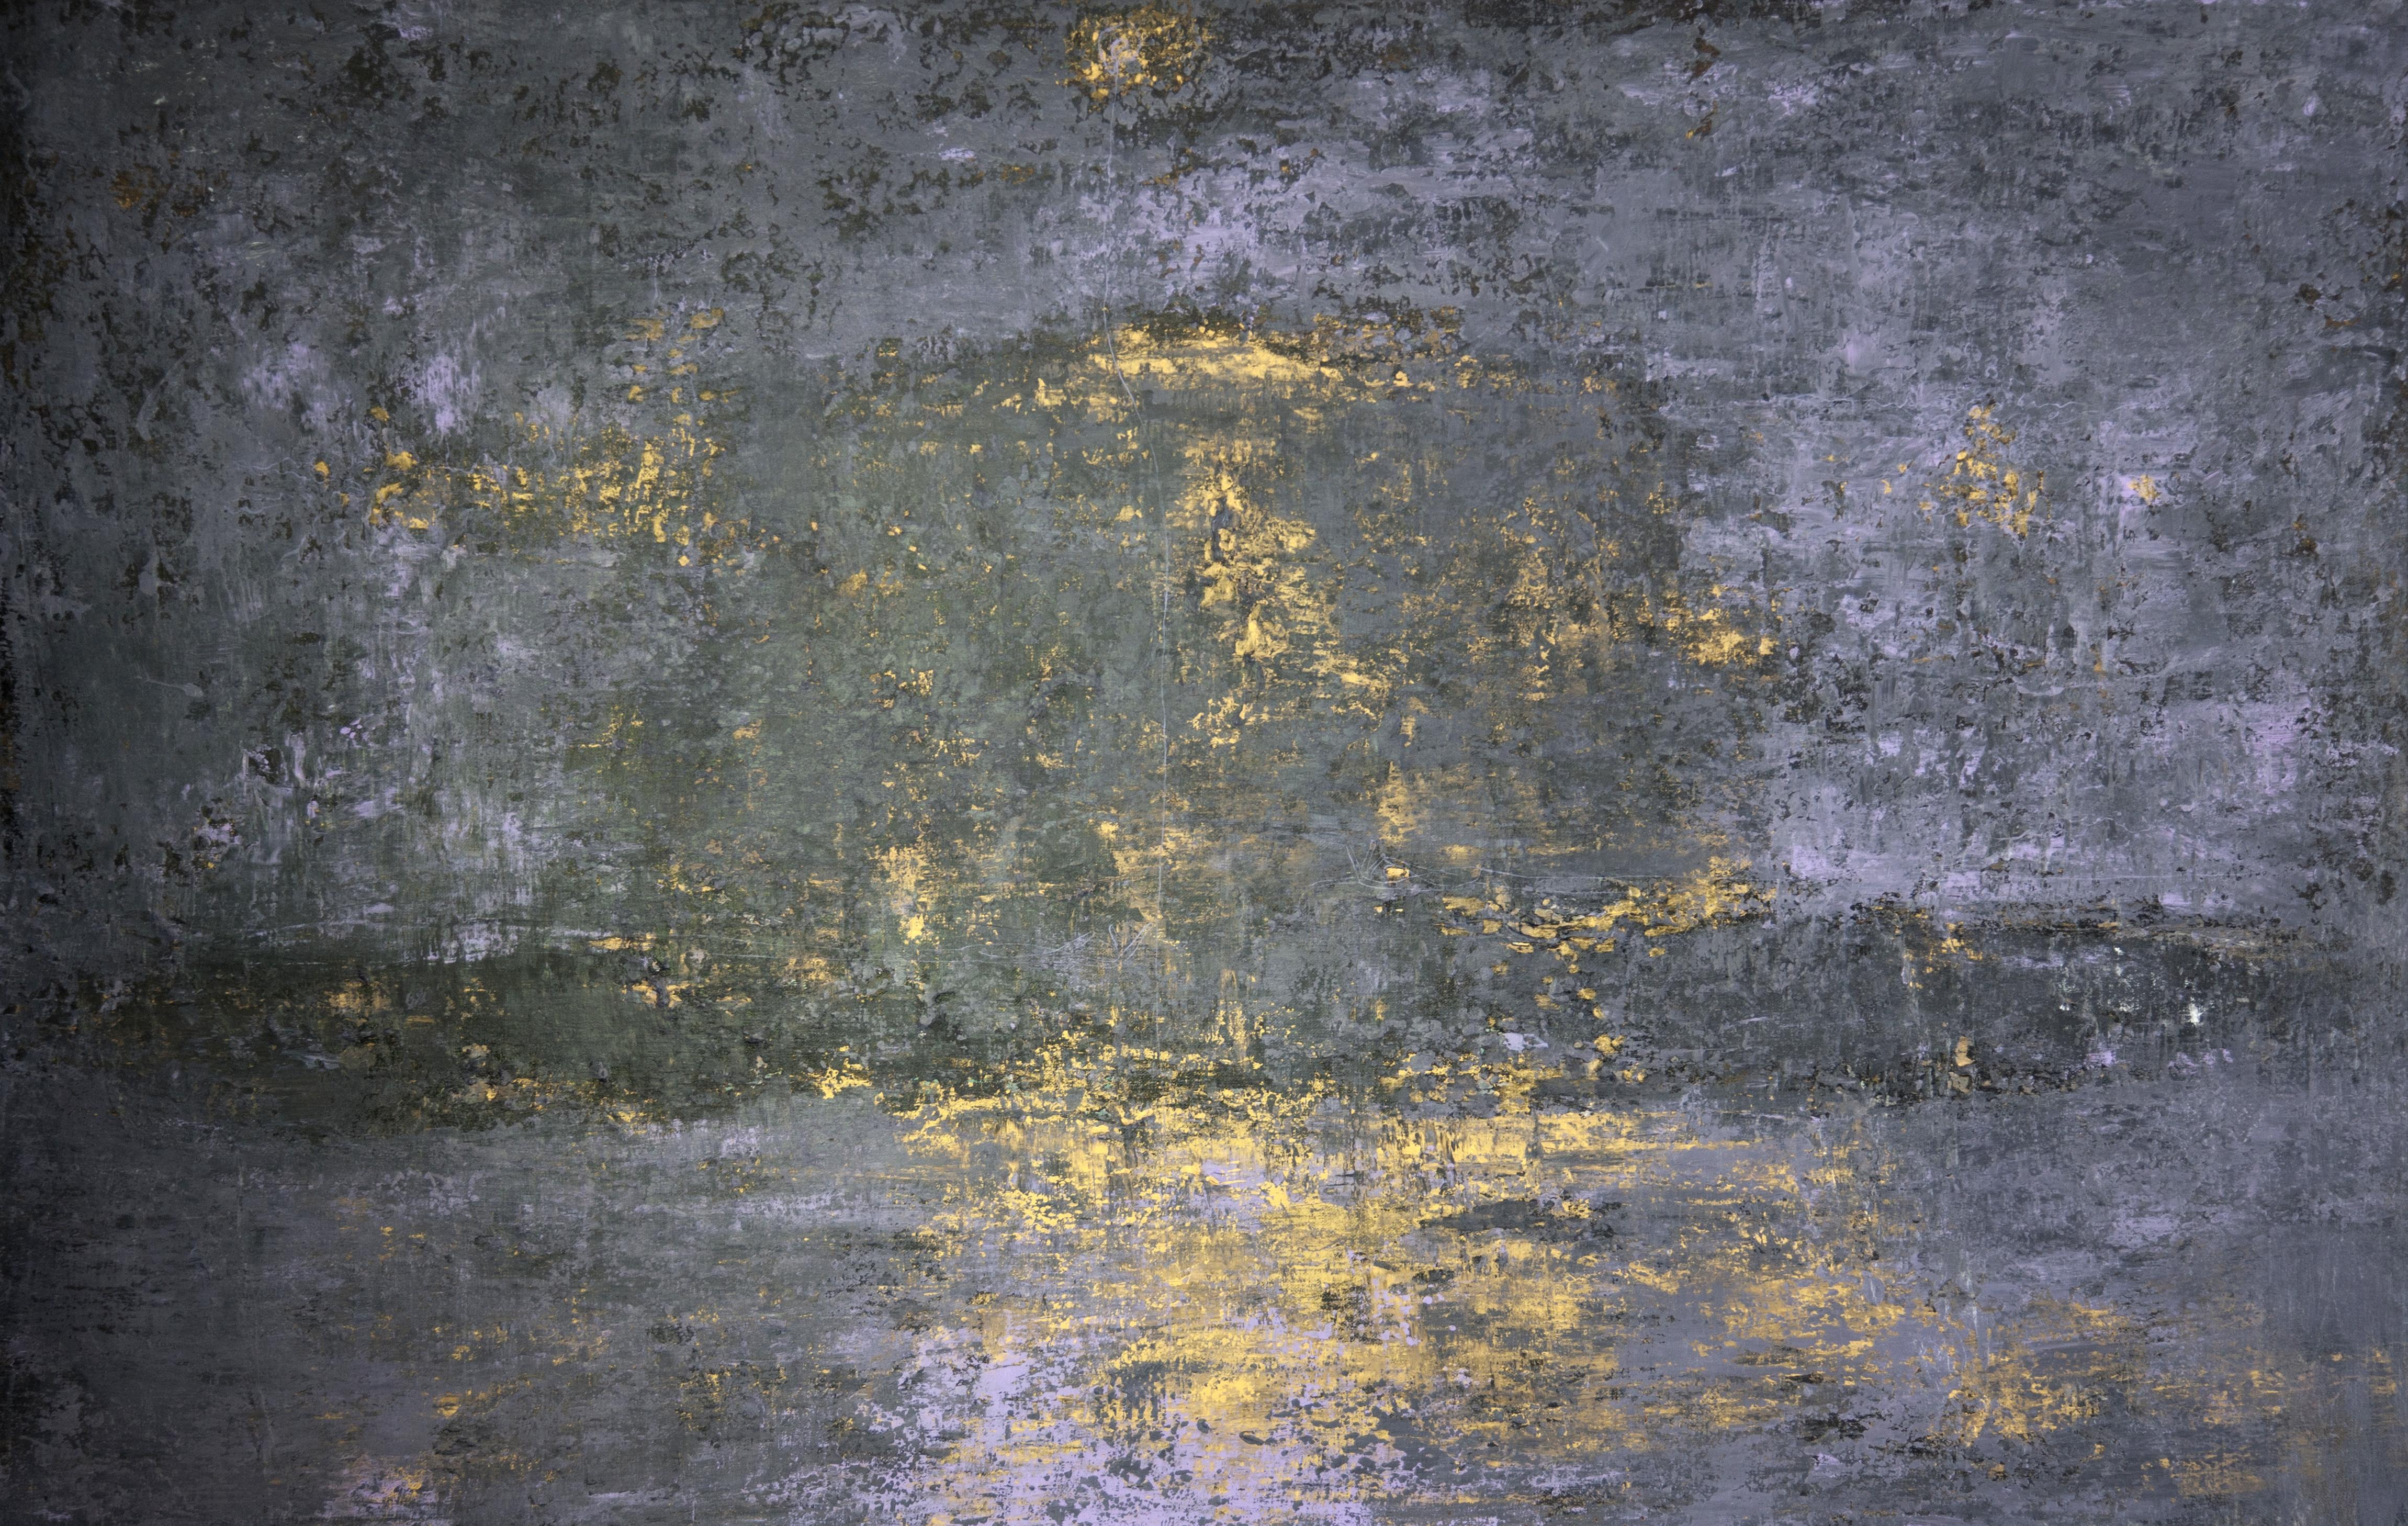 Moonlight | Ánh Trăng